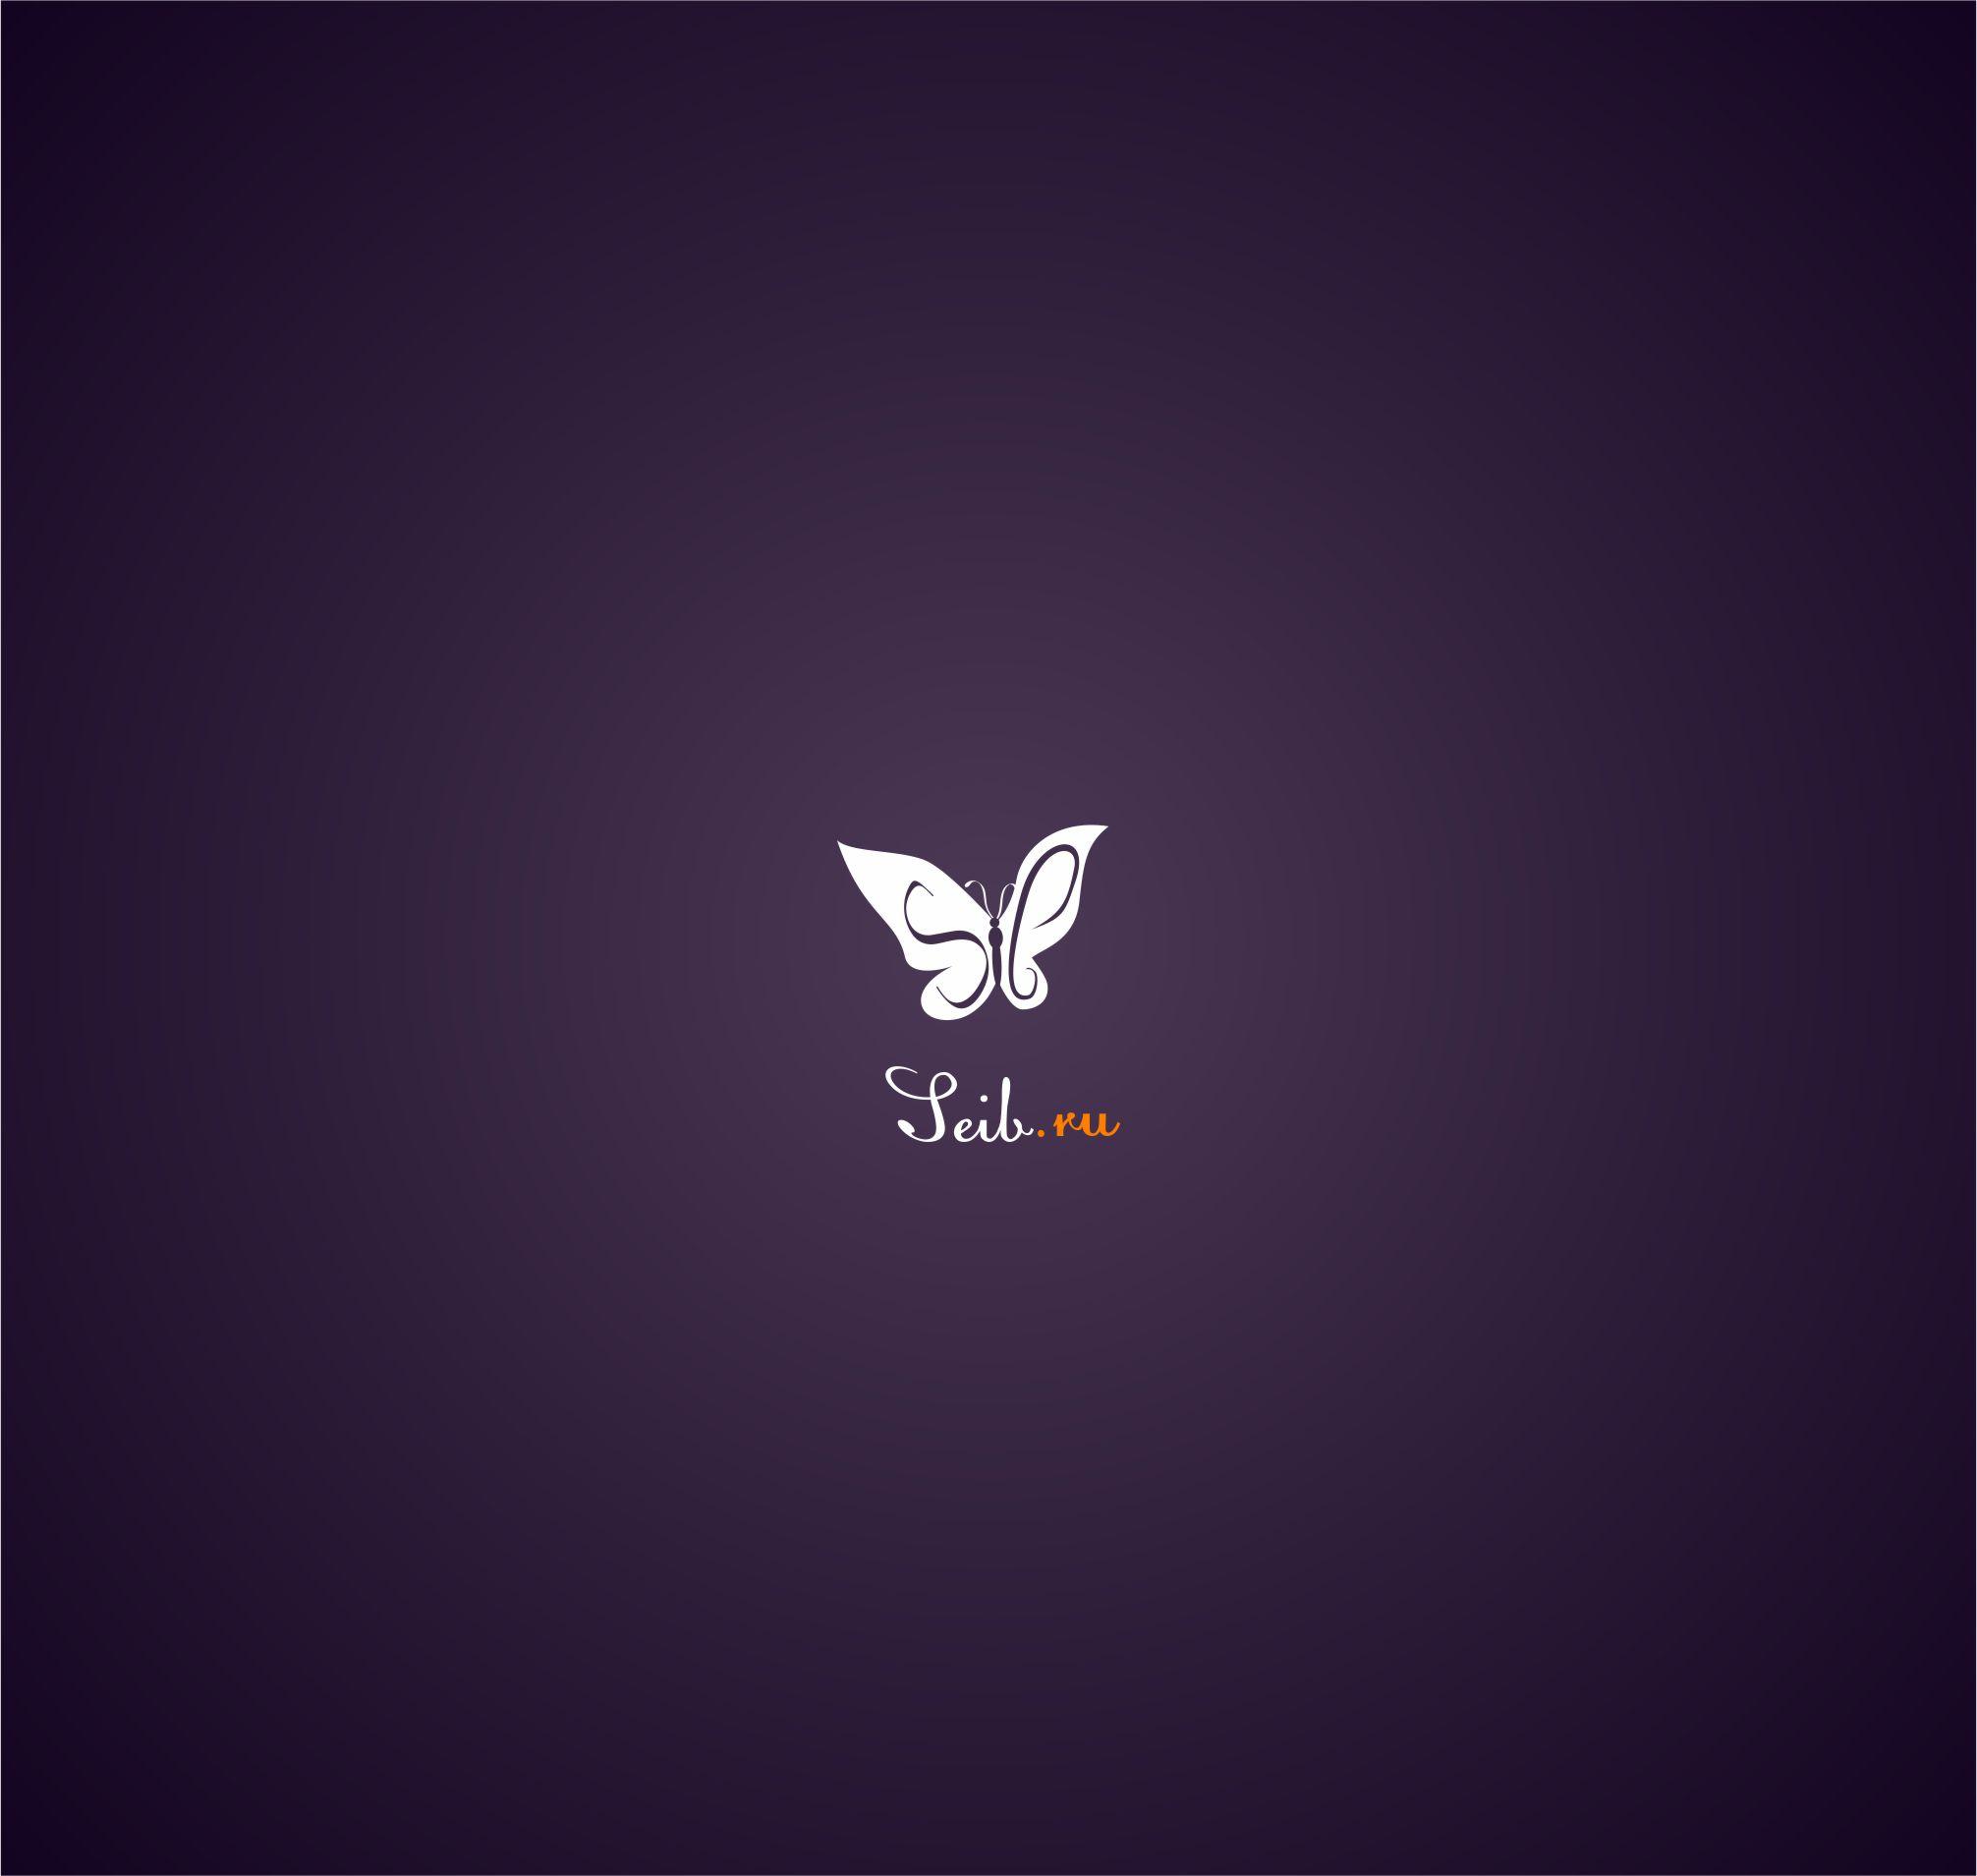 Логотип для инвестиционной компании фото f_0165140d60a2d505.jpg